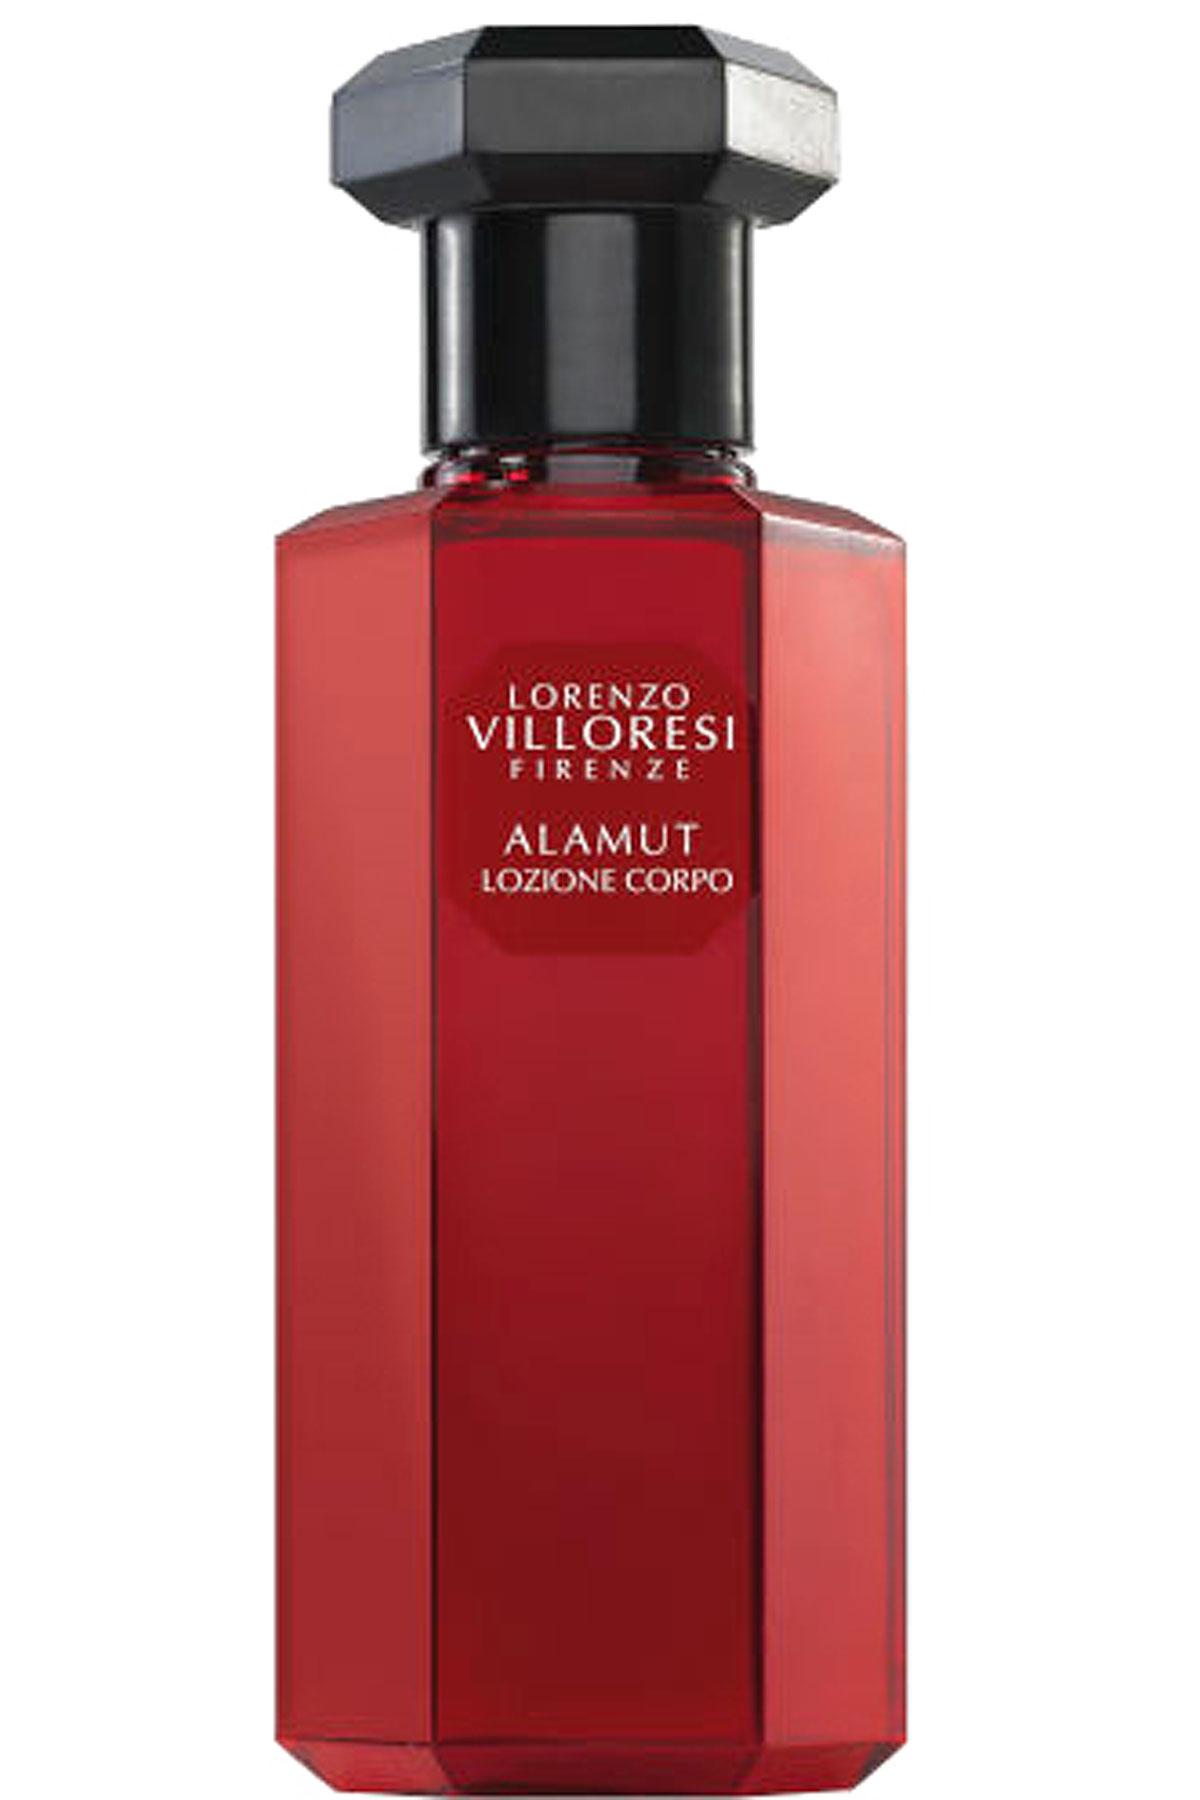 Lorenzo Villoresi Beauty for Women, Alamut - Body Lotion - 250 Ml, 2019, 250 ml